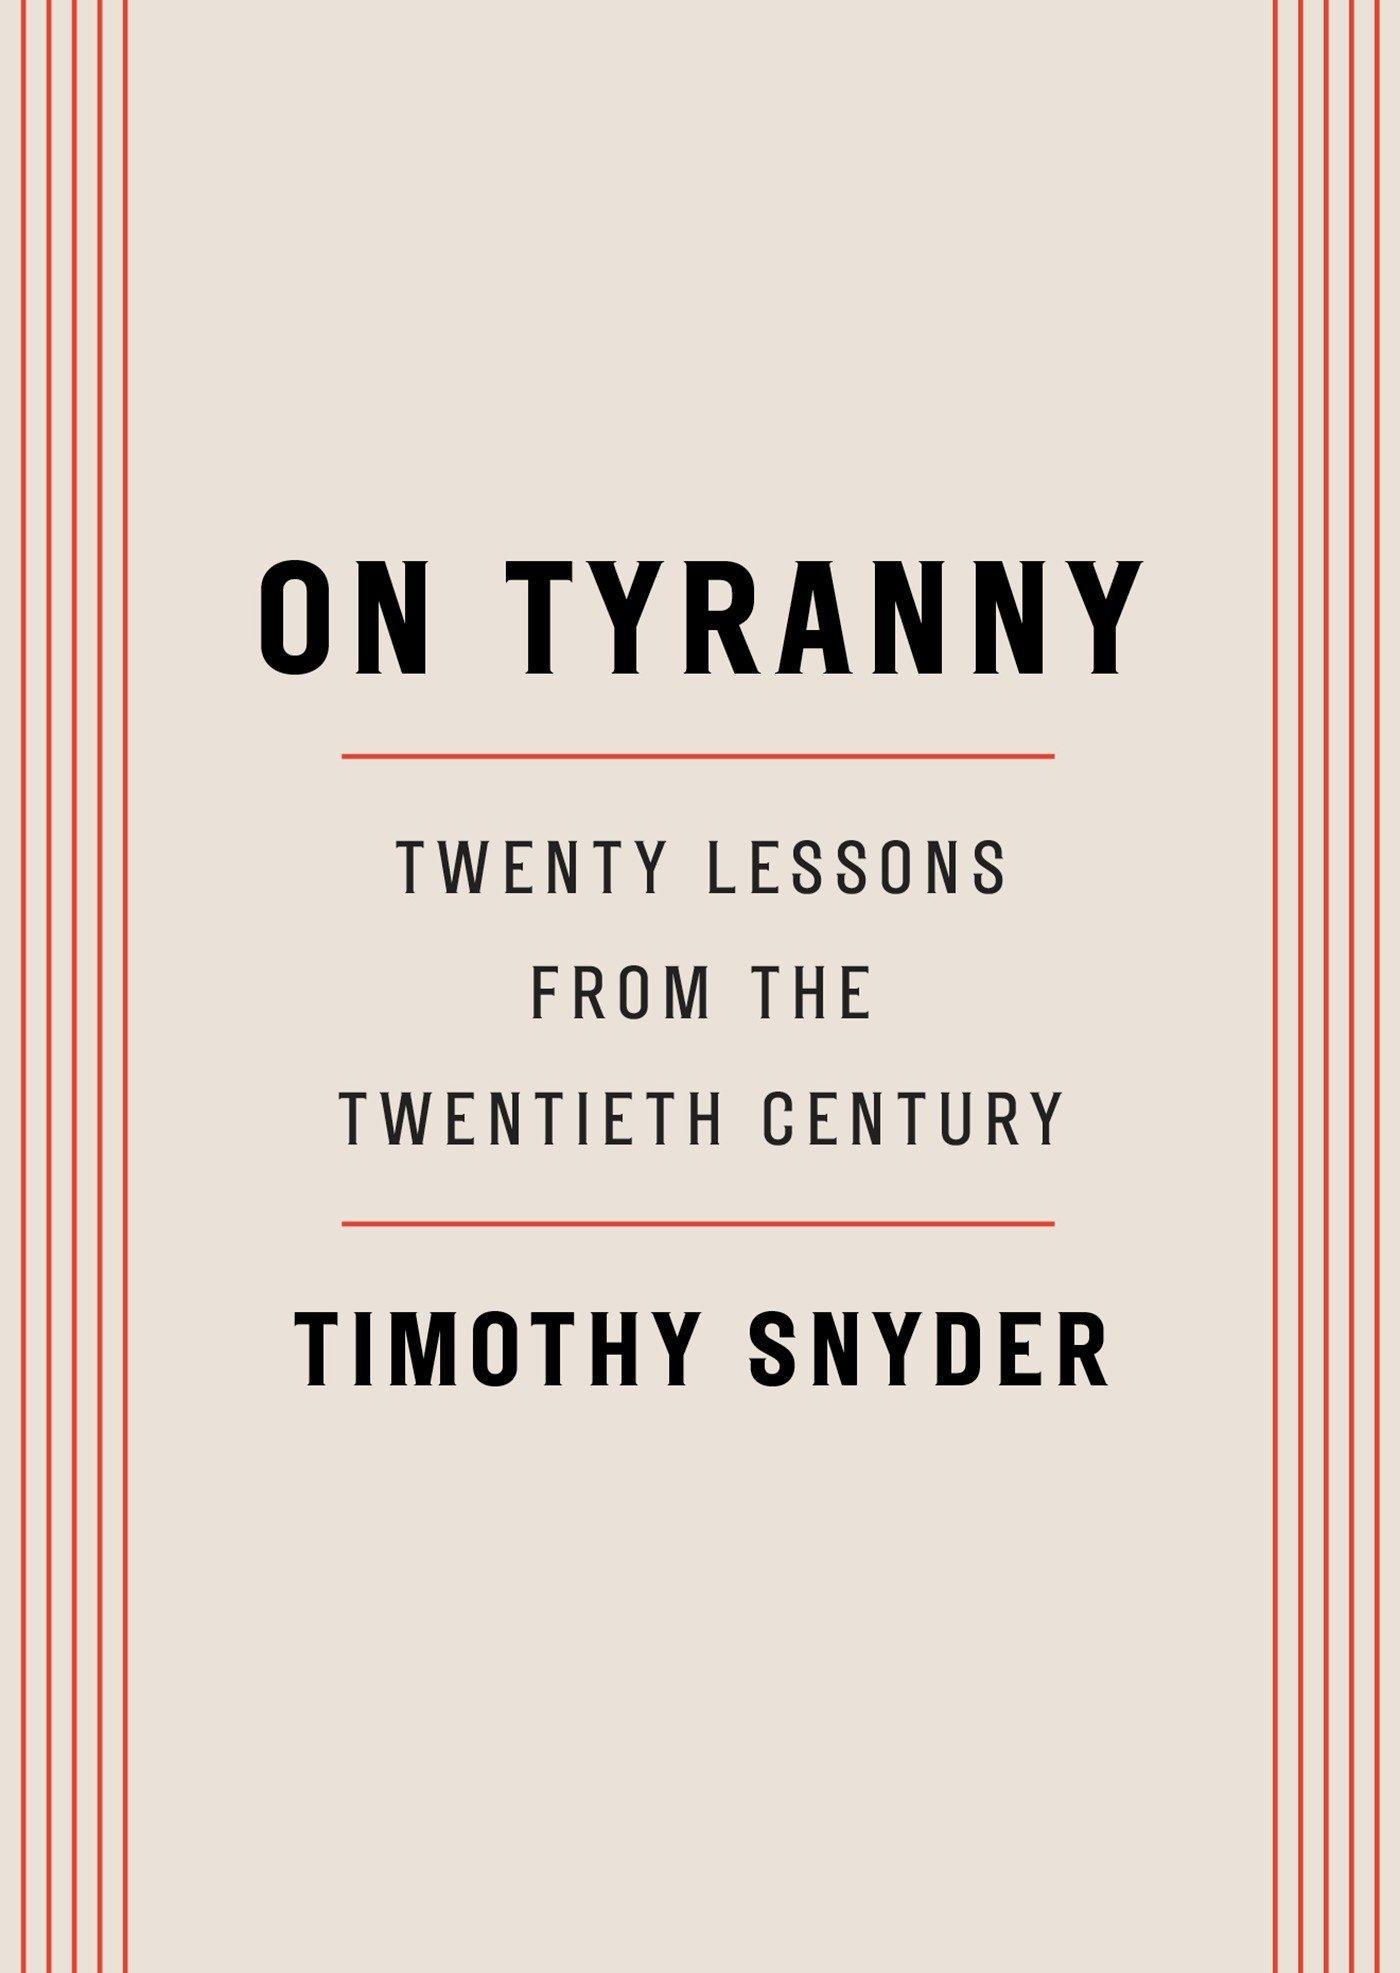 On Tyranny.jpg